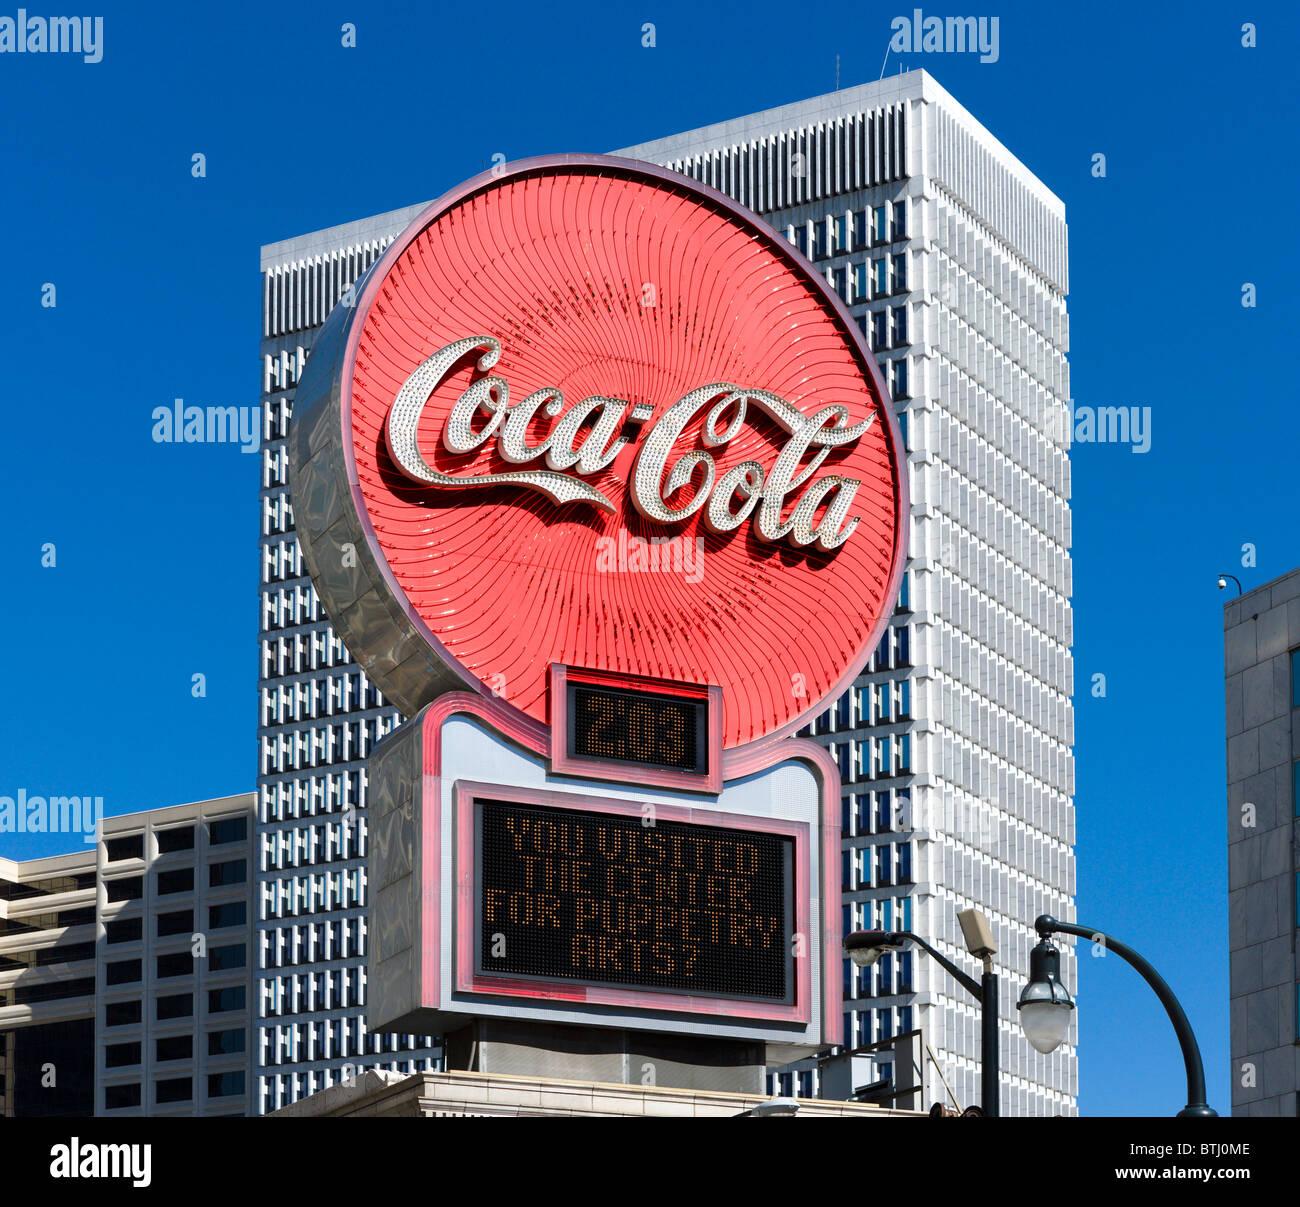 Coca Cola clock near Five Points, Peachtree Street, Downtown Atlanta, Georgia, USA - Stock Image